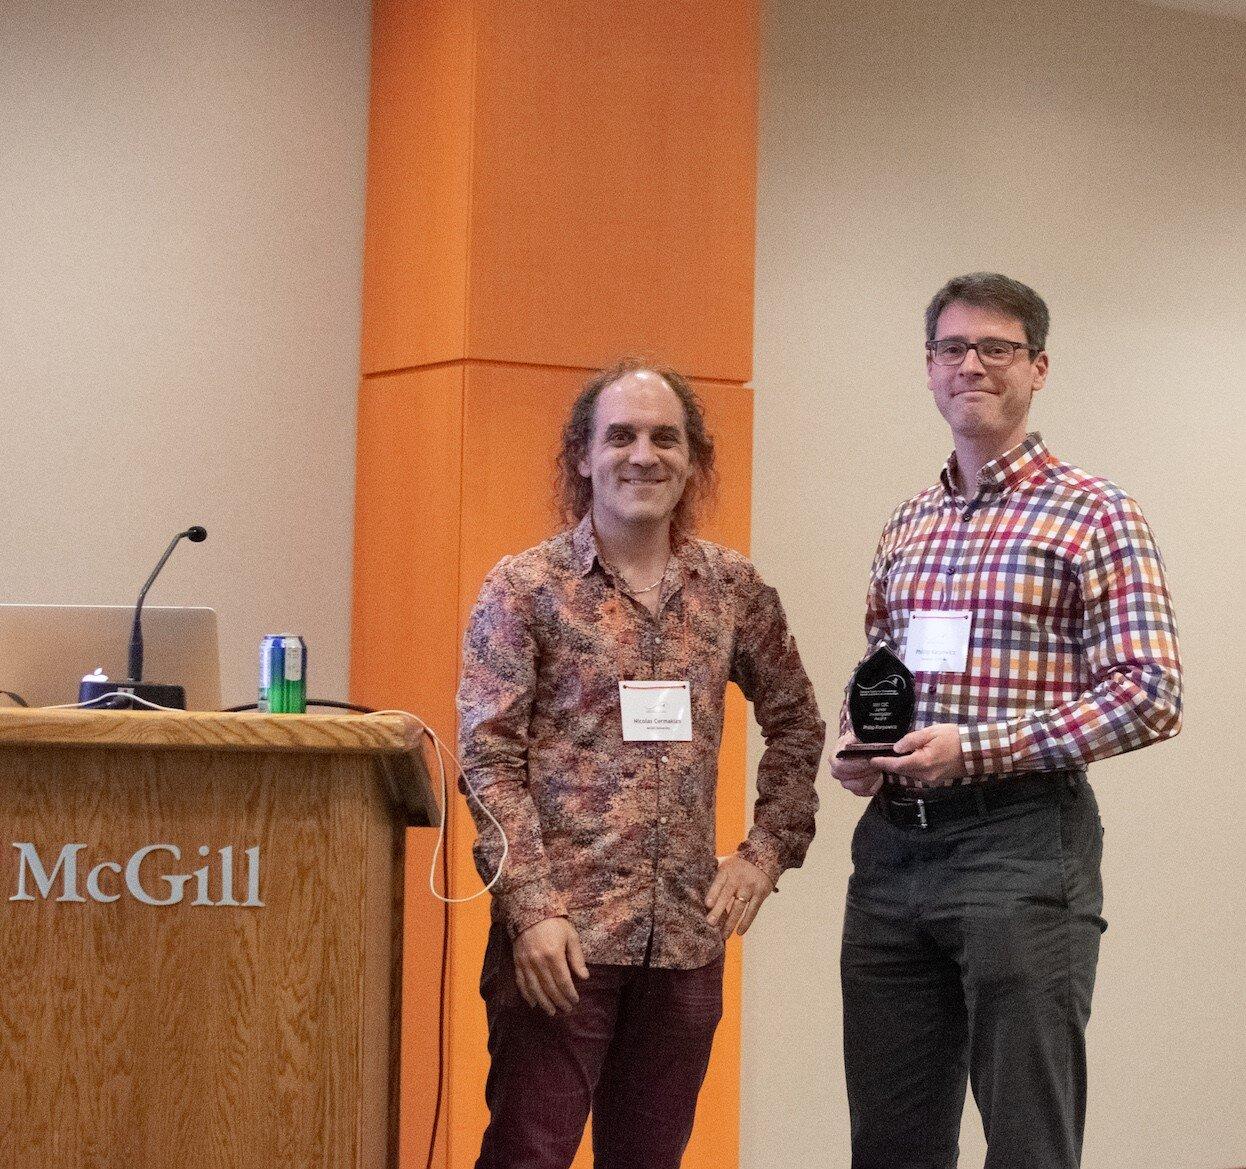 CSC Junior investigator Award Left to right: Nicolas Cermakian, Phillip Karpowicz